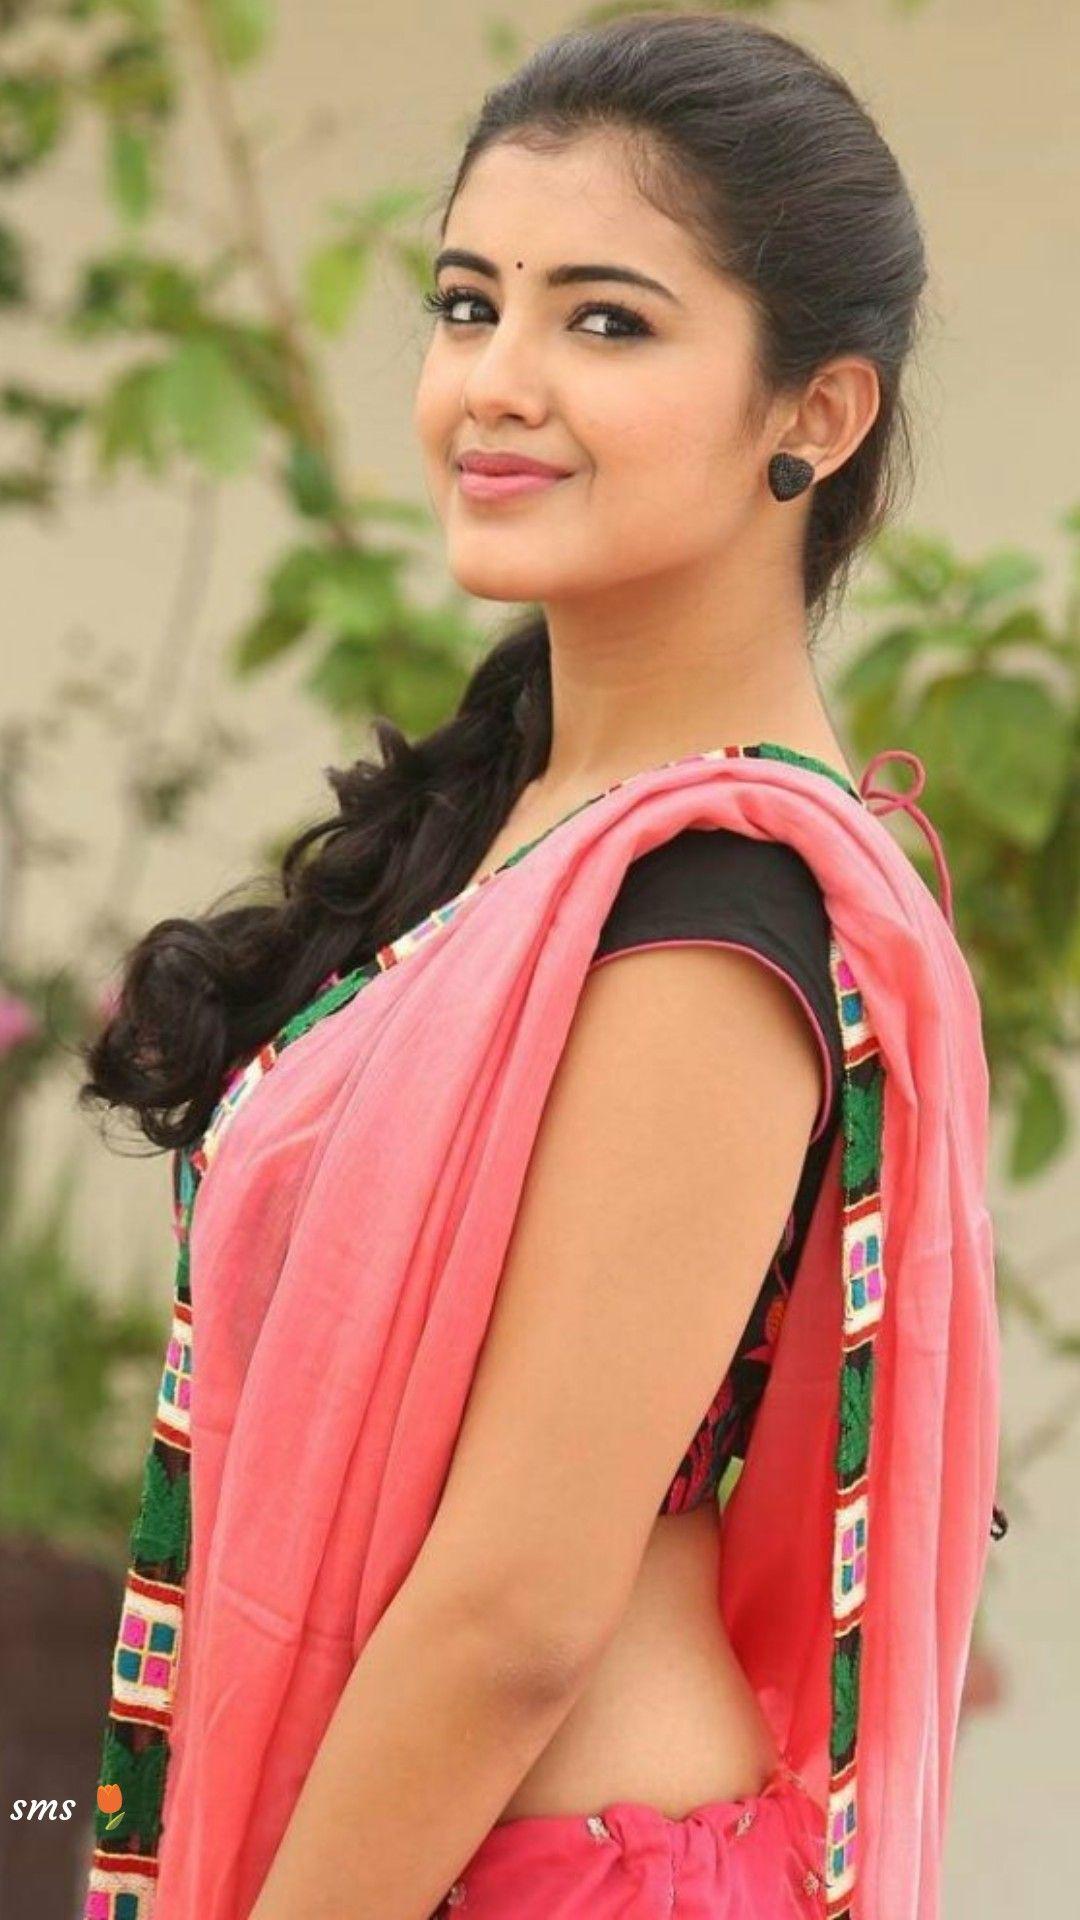 pinganta rk on chamak | pinterest | indian beauty, saree and